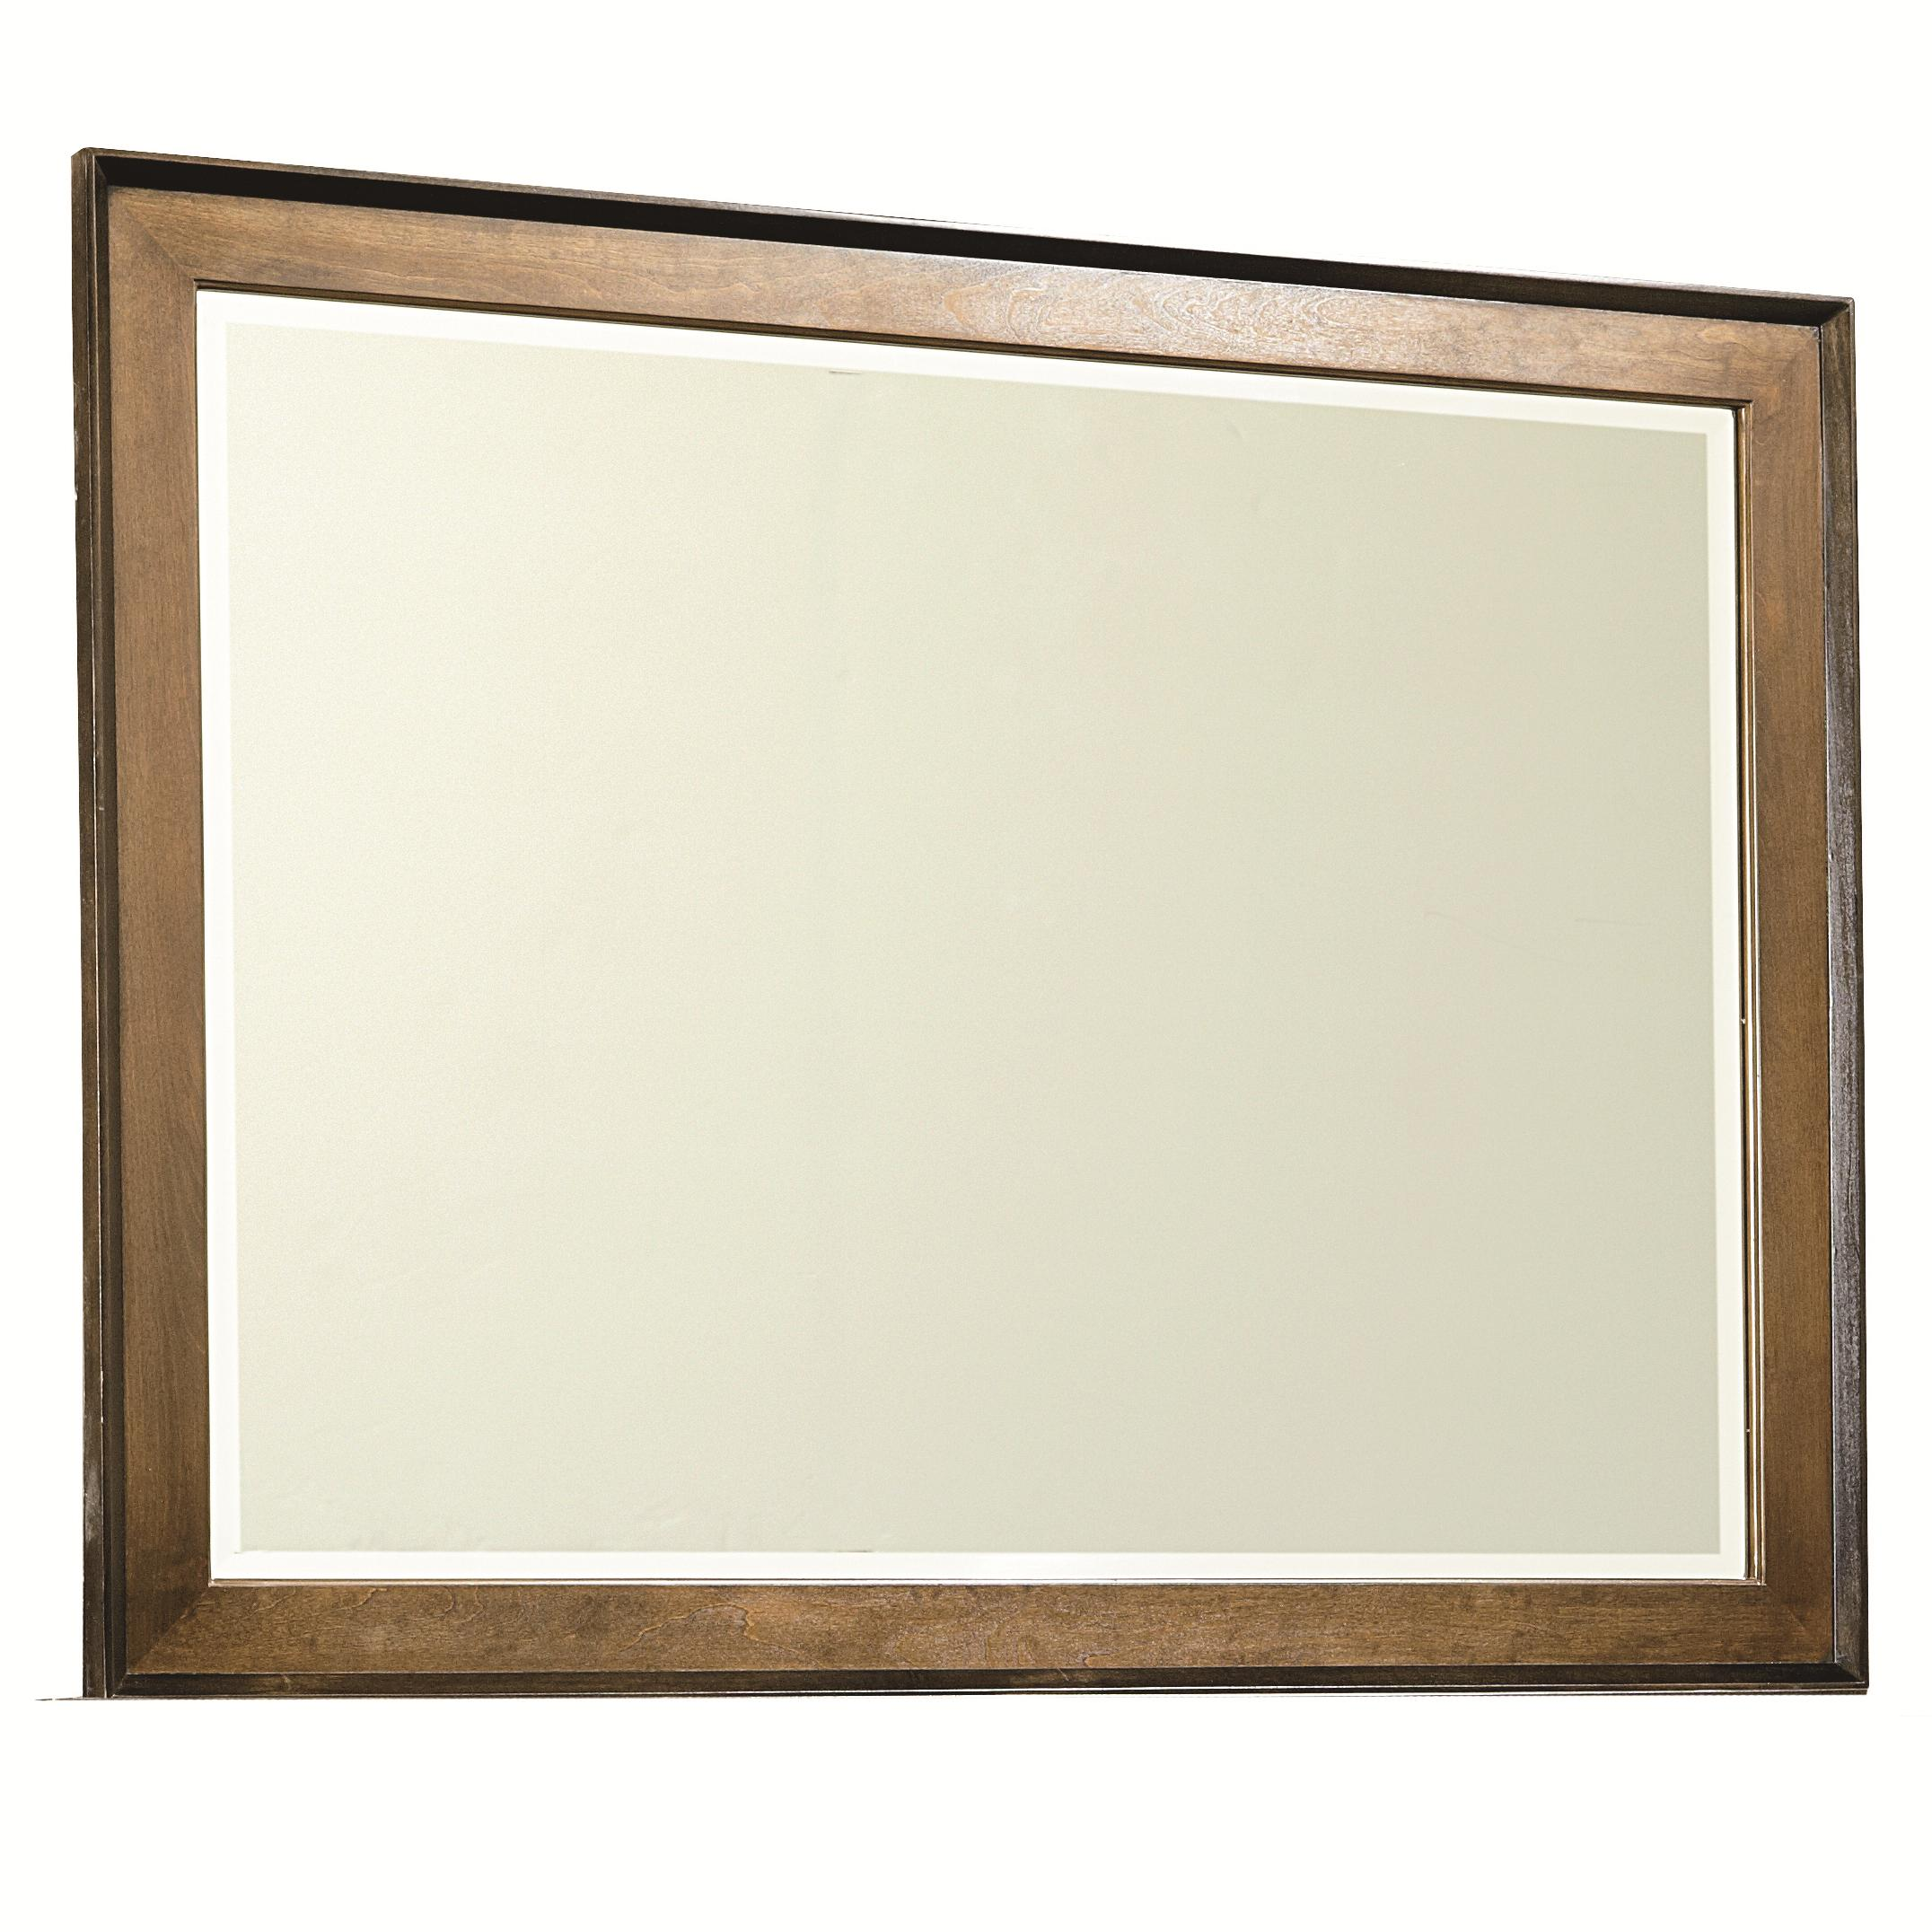 Legacy Classic Kateri Dresser Mirror - Item Number: 3600-0400